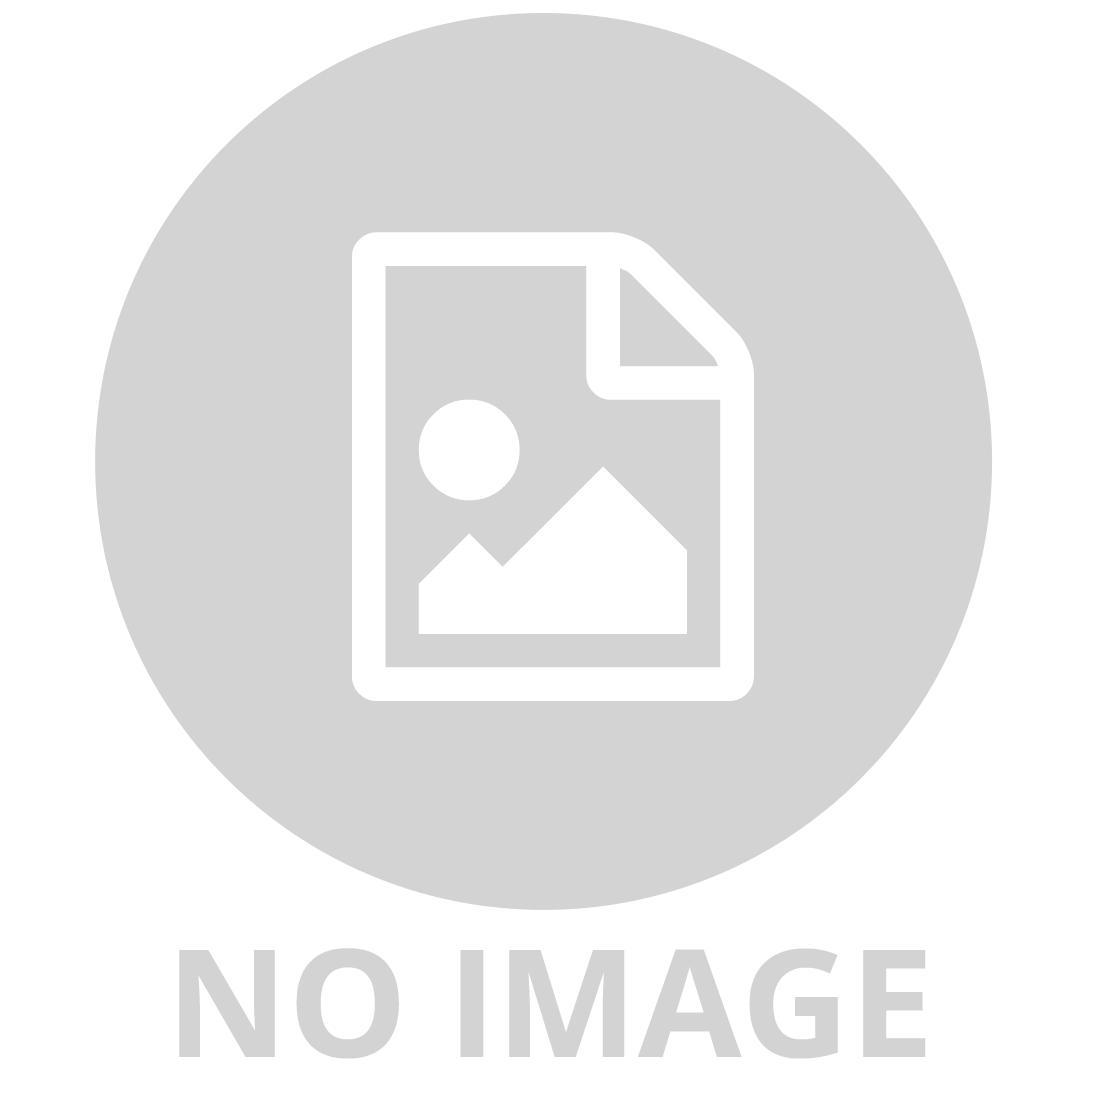 LEGO CREATOR 10712 BRICKS AND GEARS